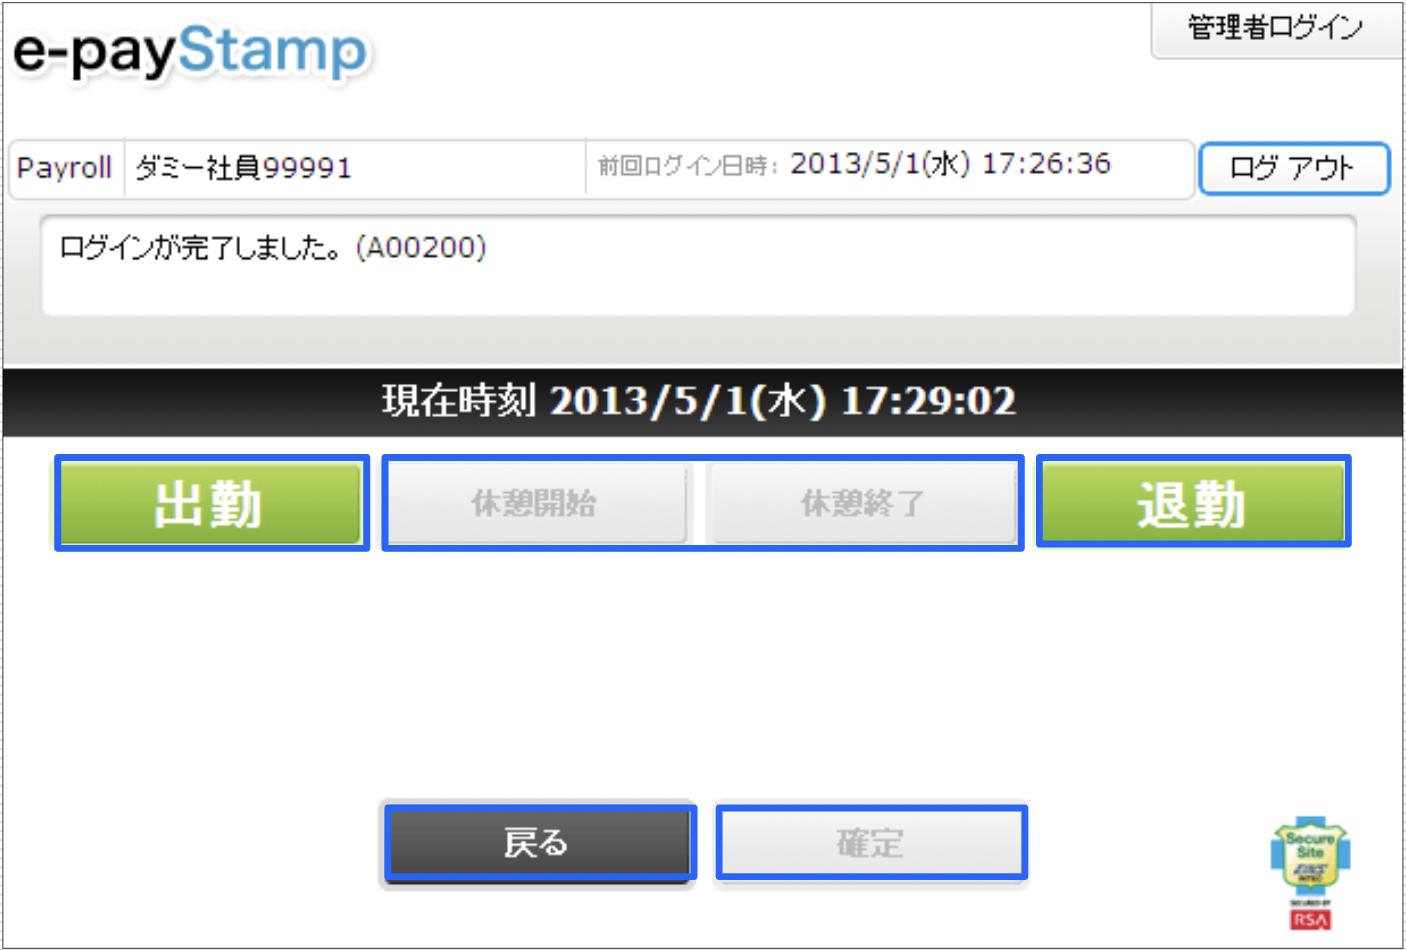 e-payの打刻画面(PC)